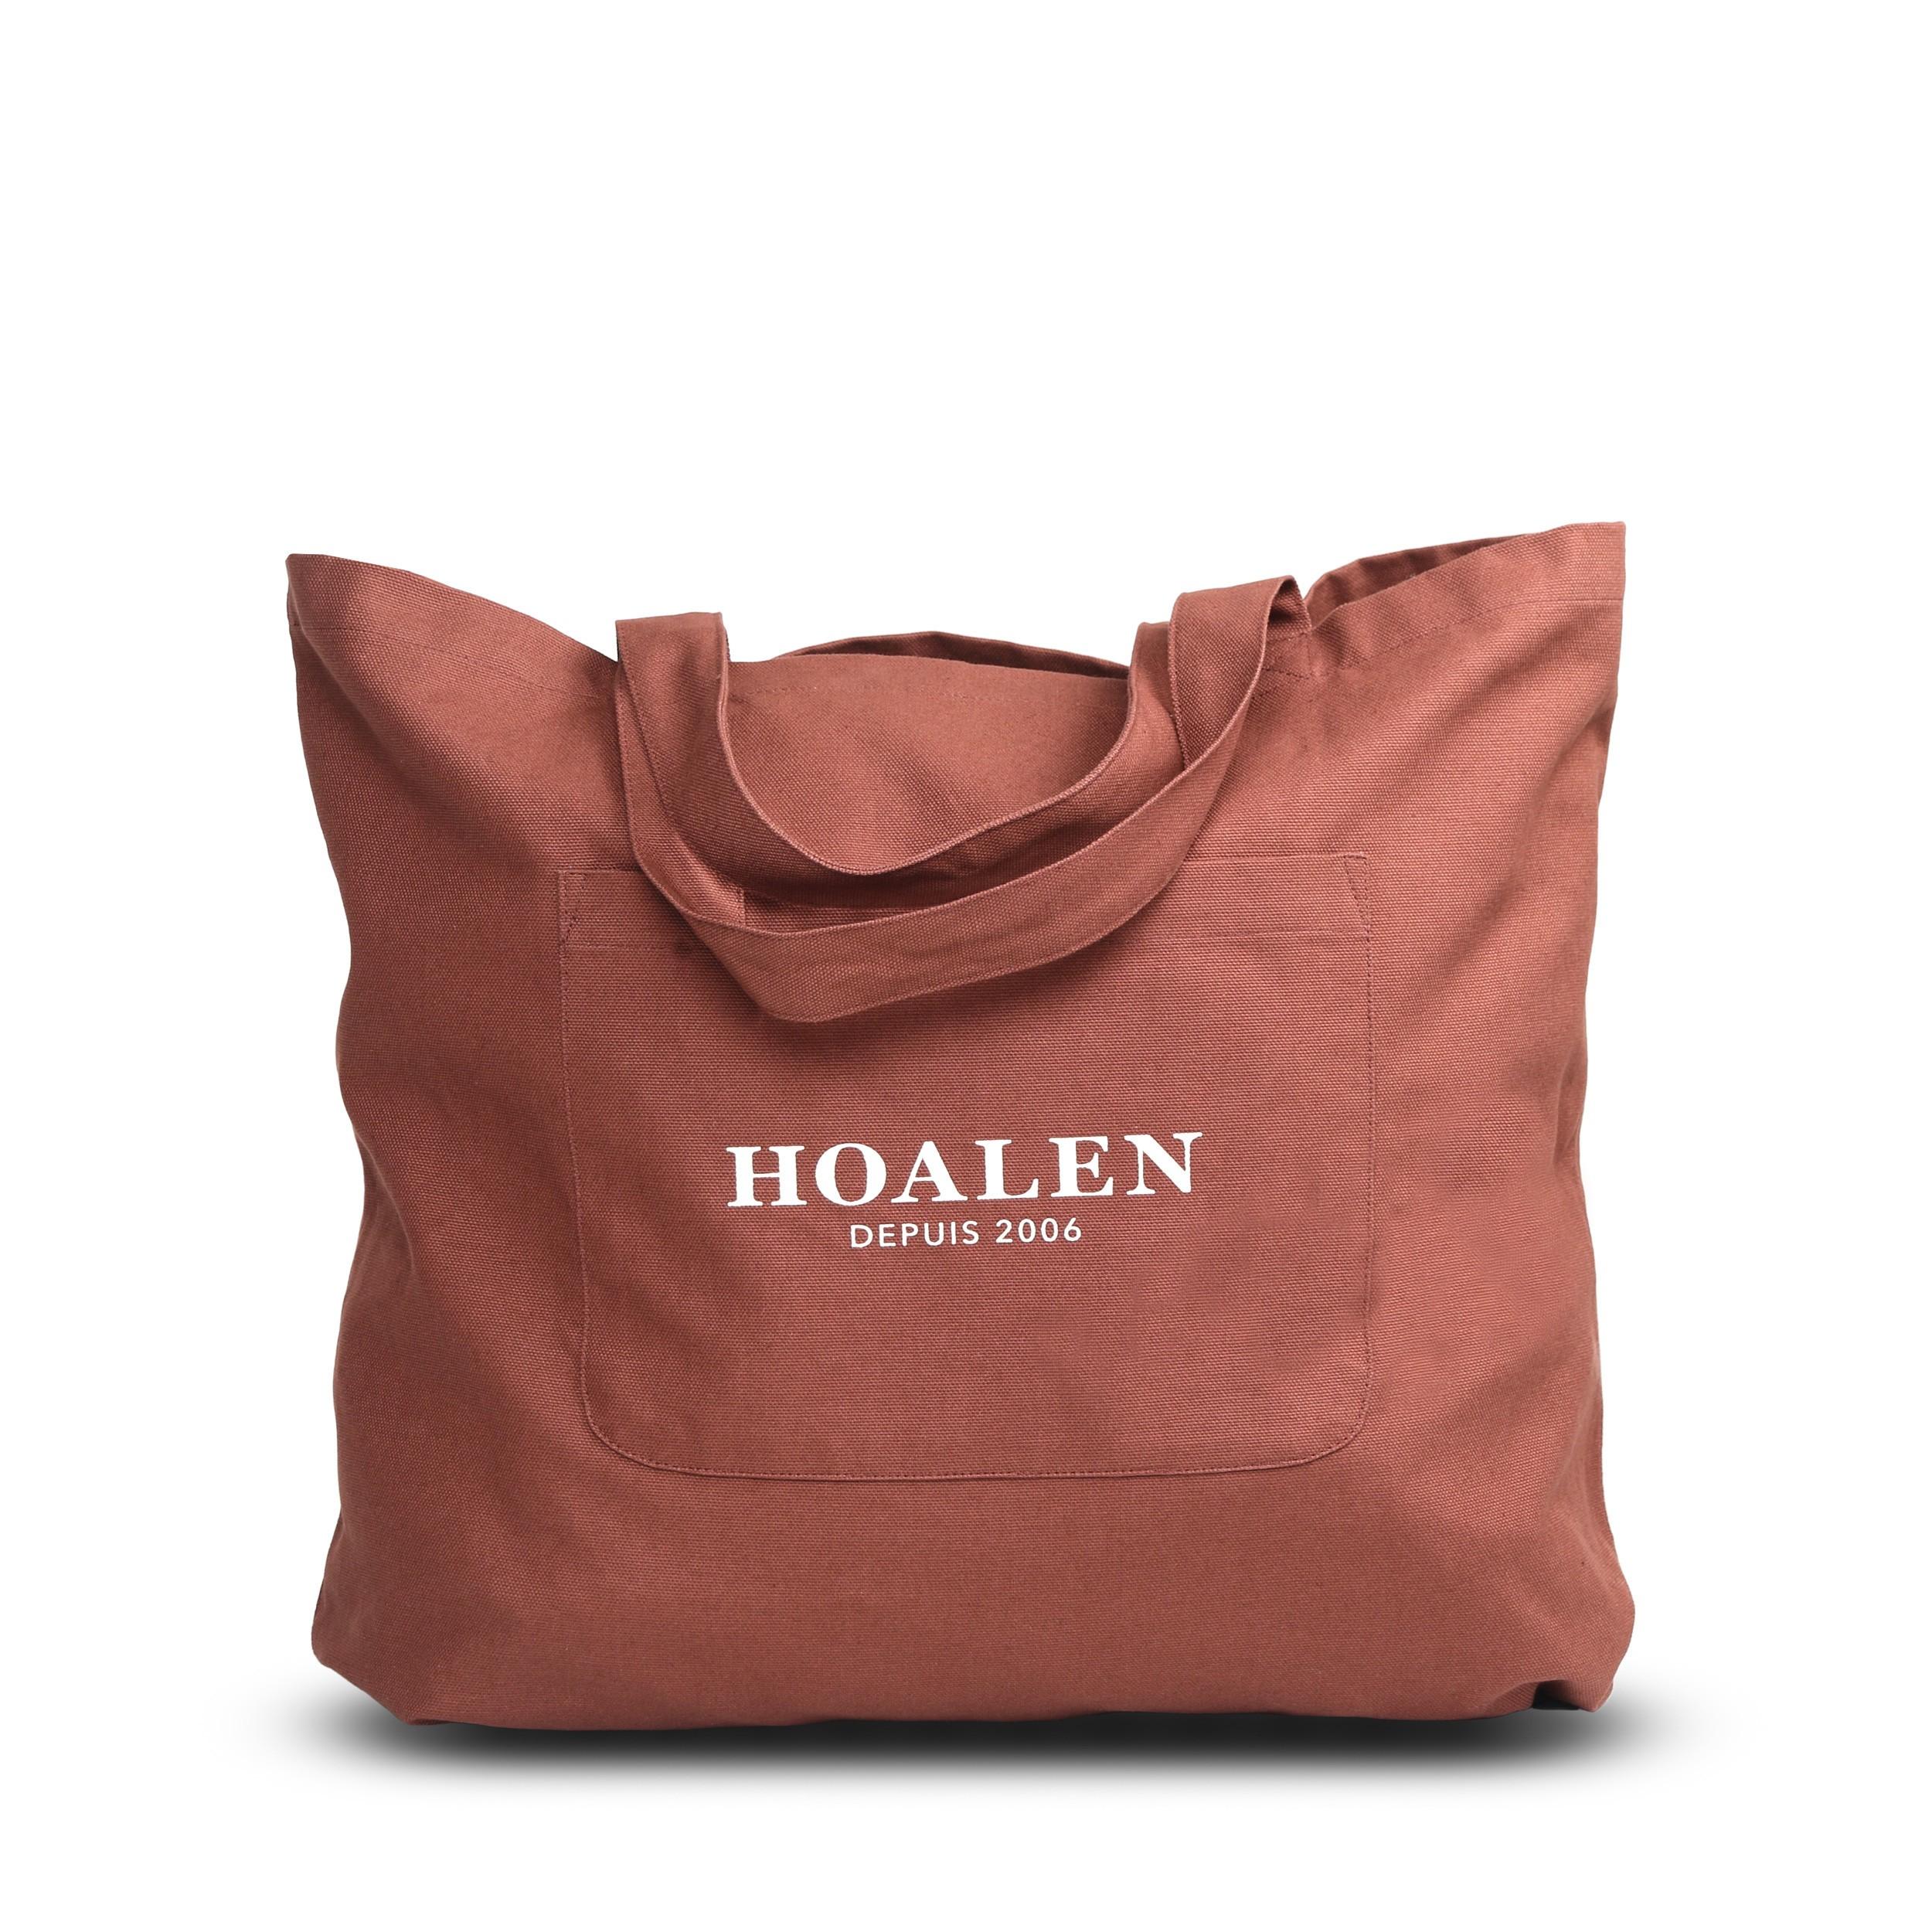 Oversize beach bag